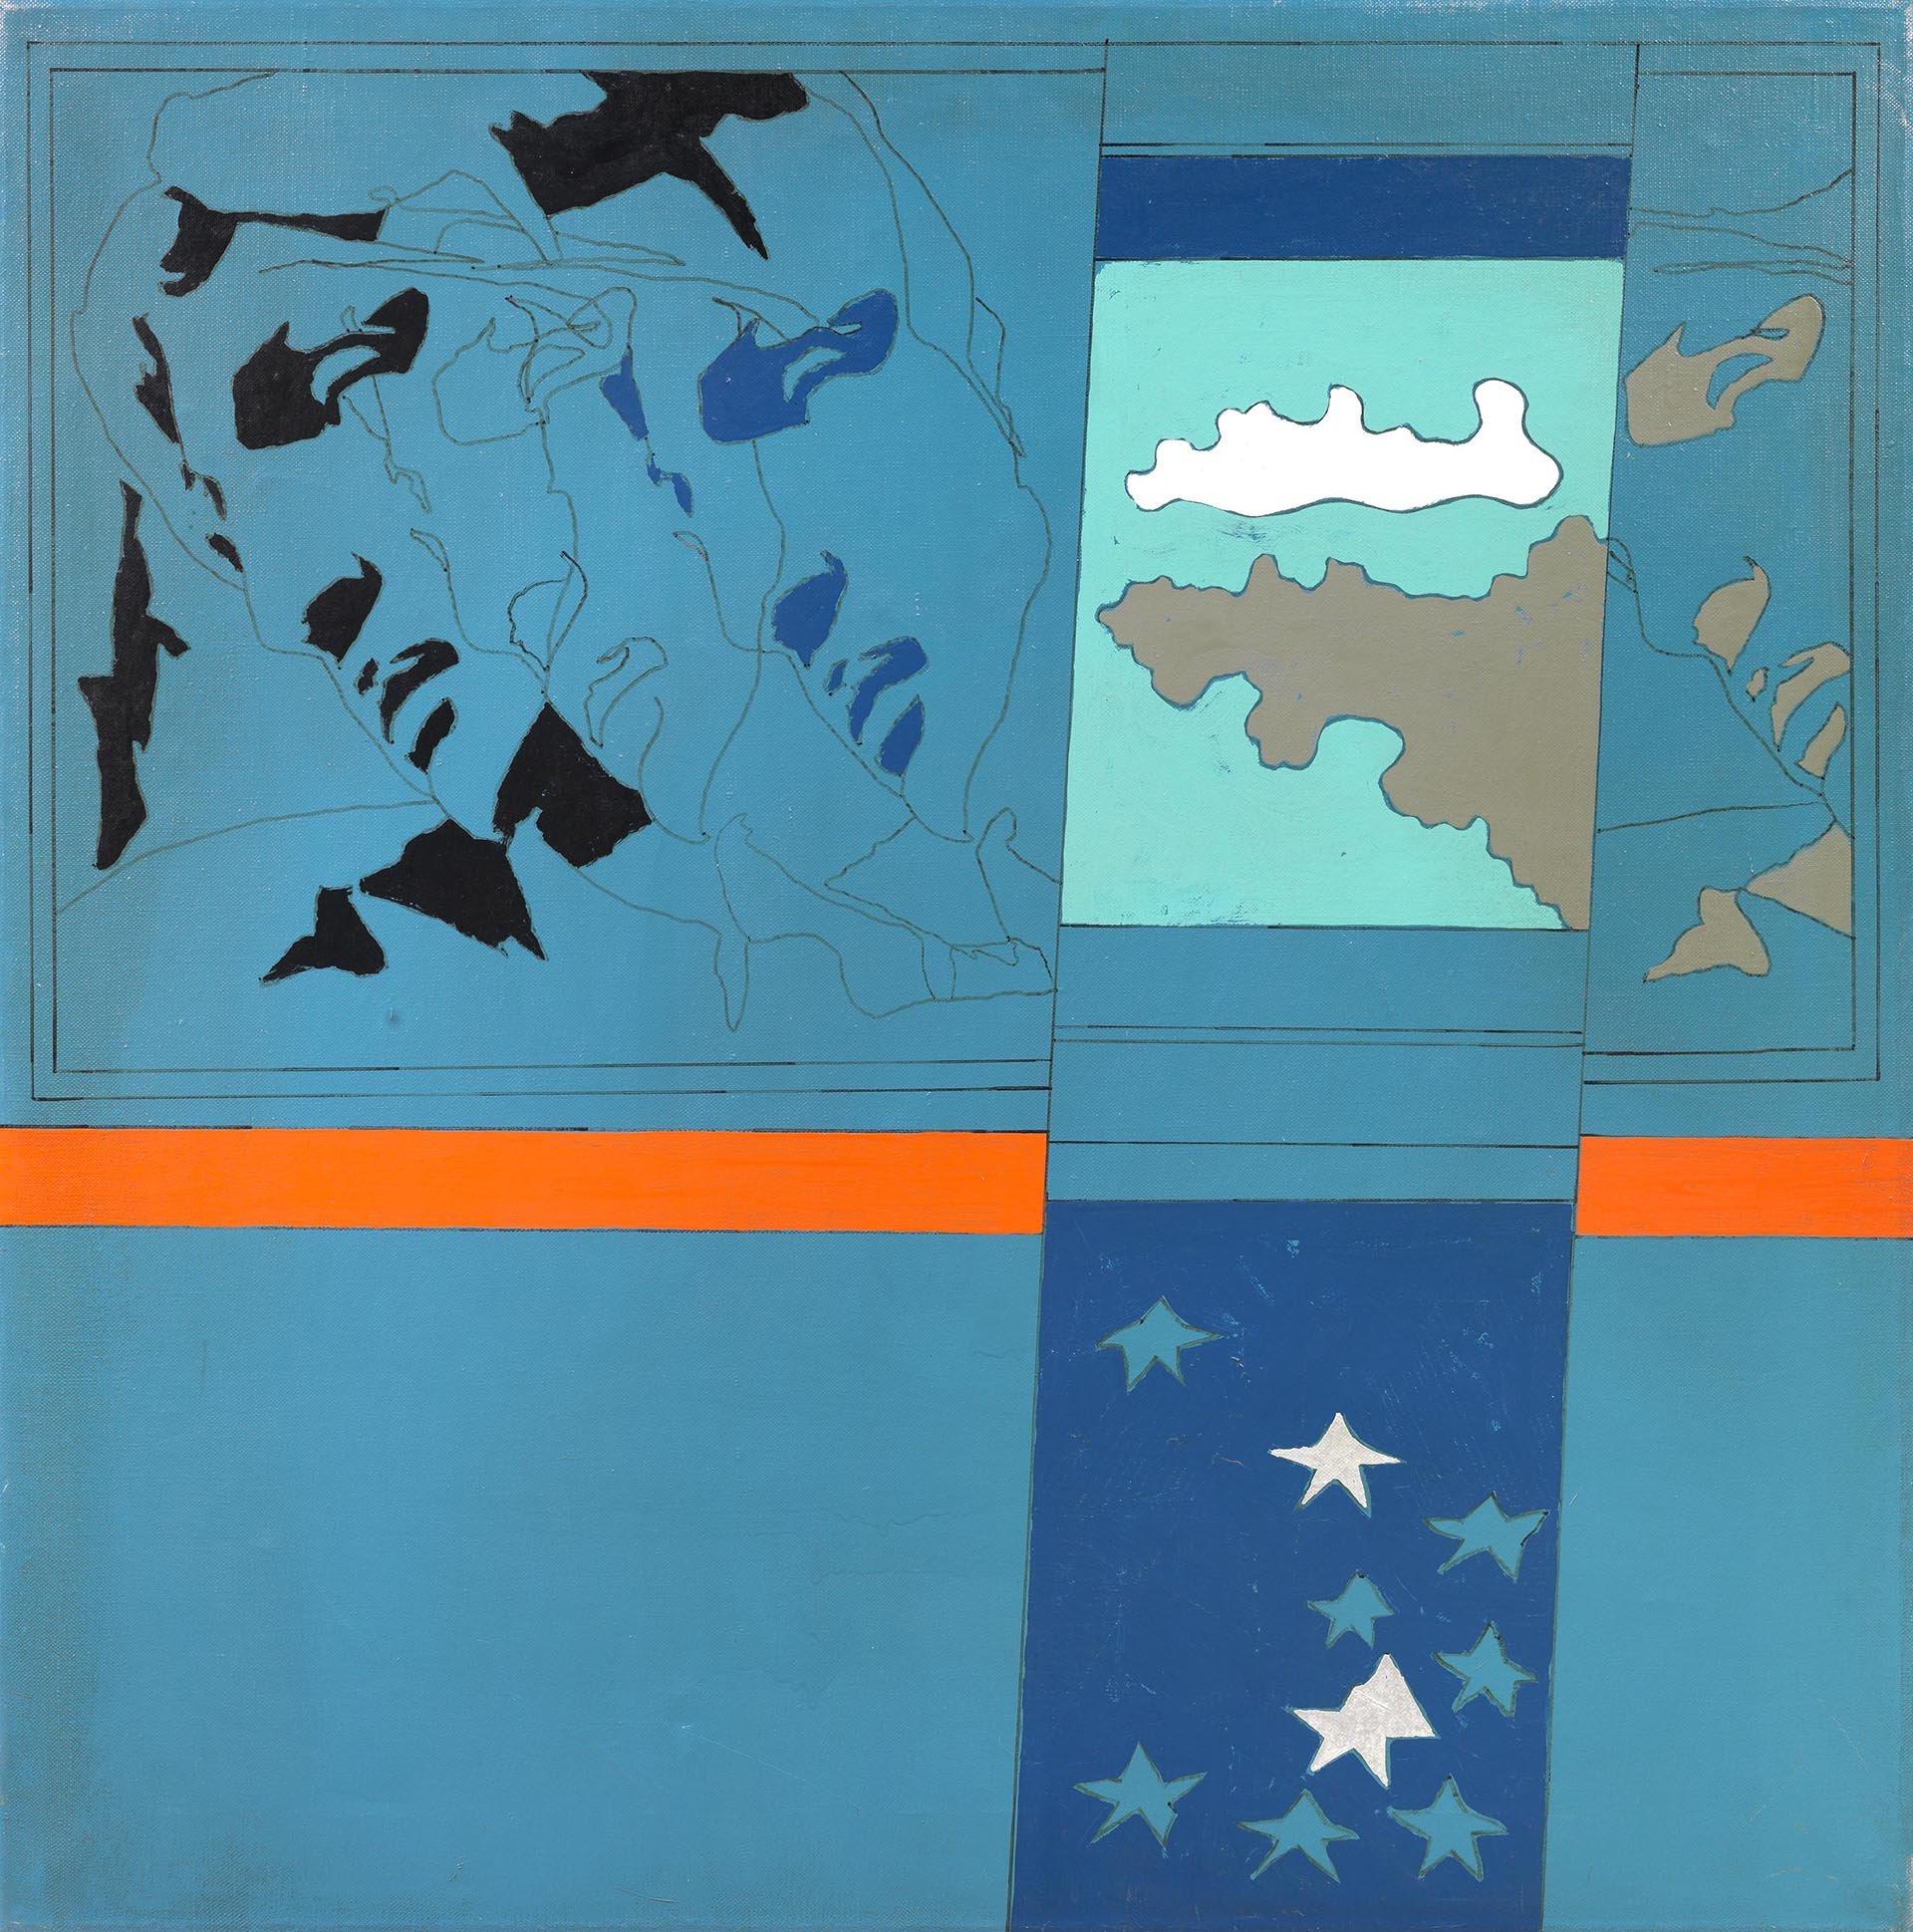 Festa, The strike of the stars Michelangelo according to Tano Festa n° 17, 1967, 92x91 cm